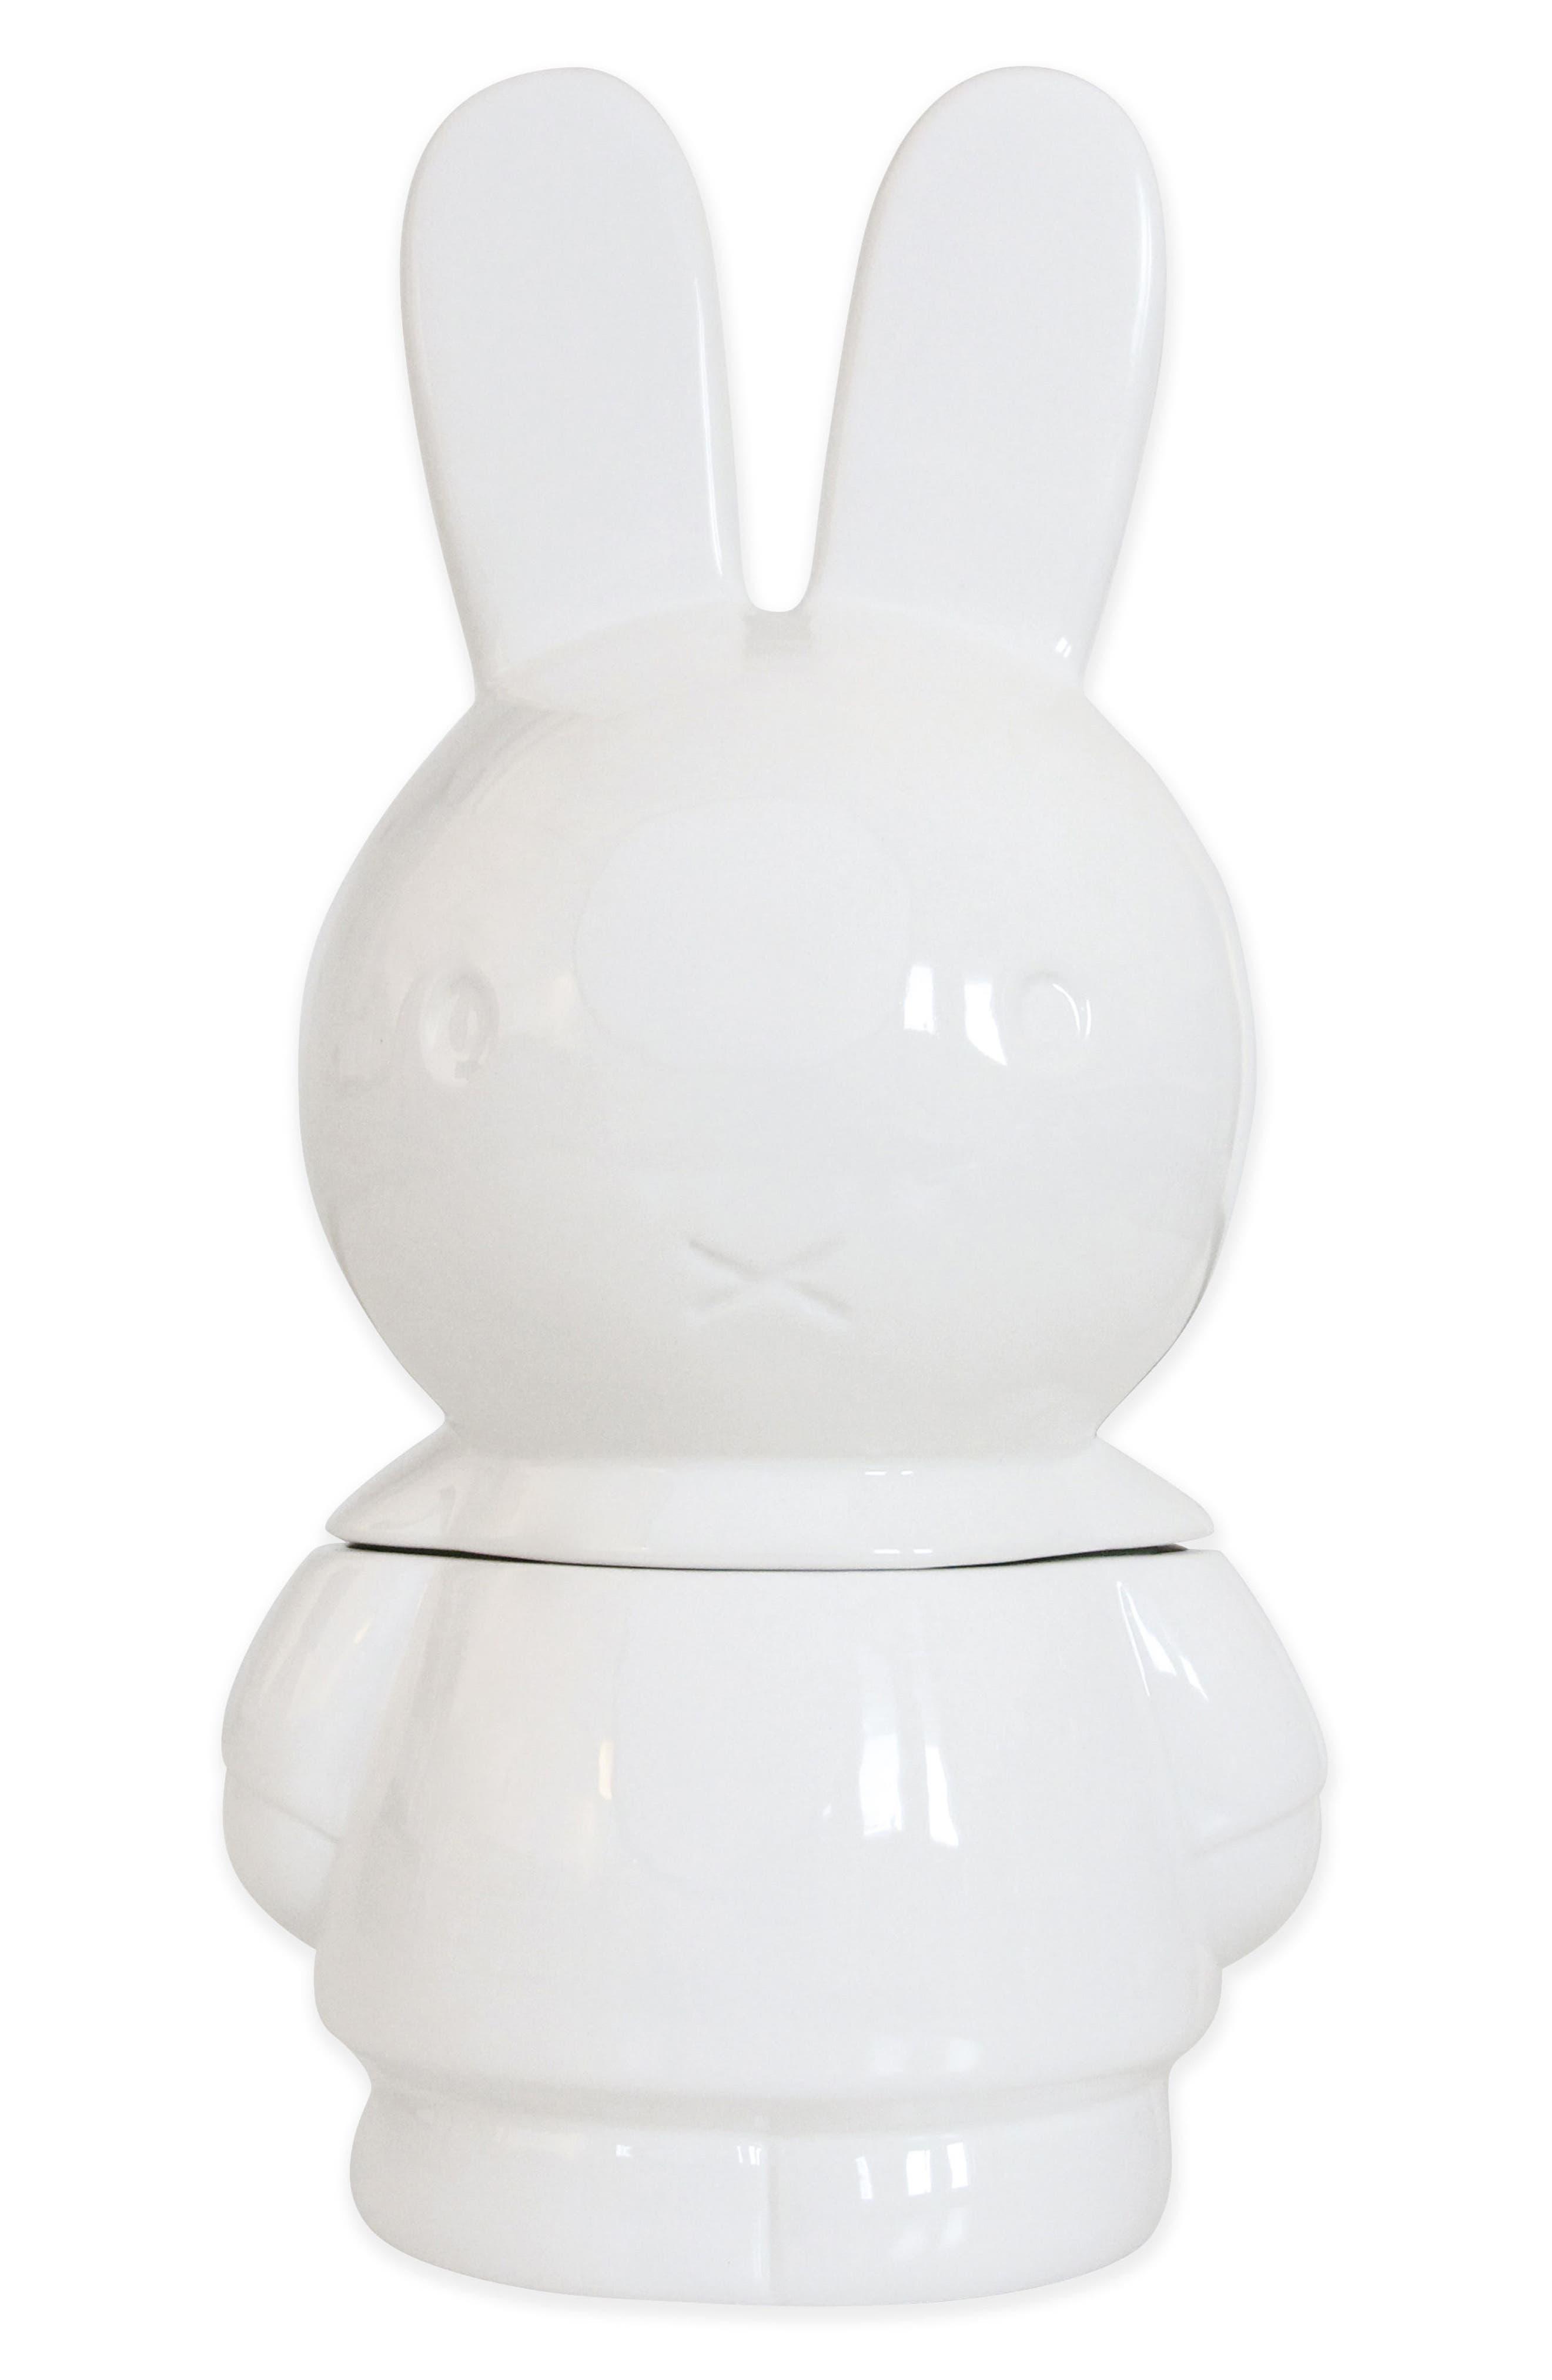 Miffy Ceramic Cookie Jar,                             Alternate thumbnail 2, color,                             100